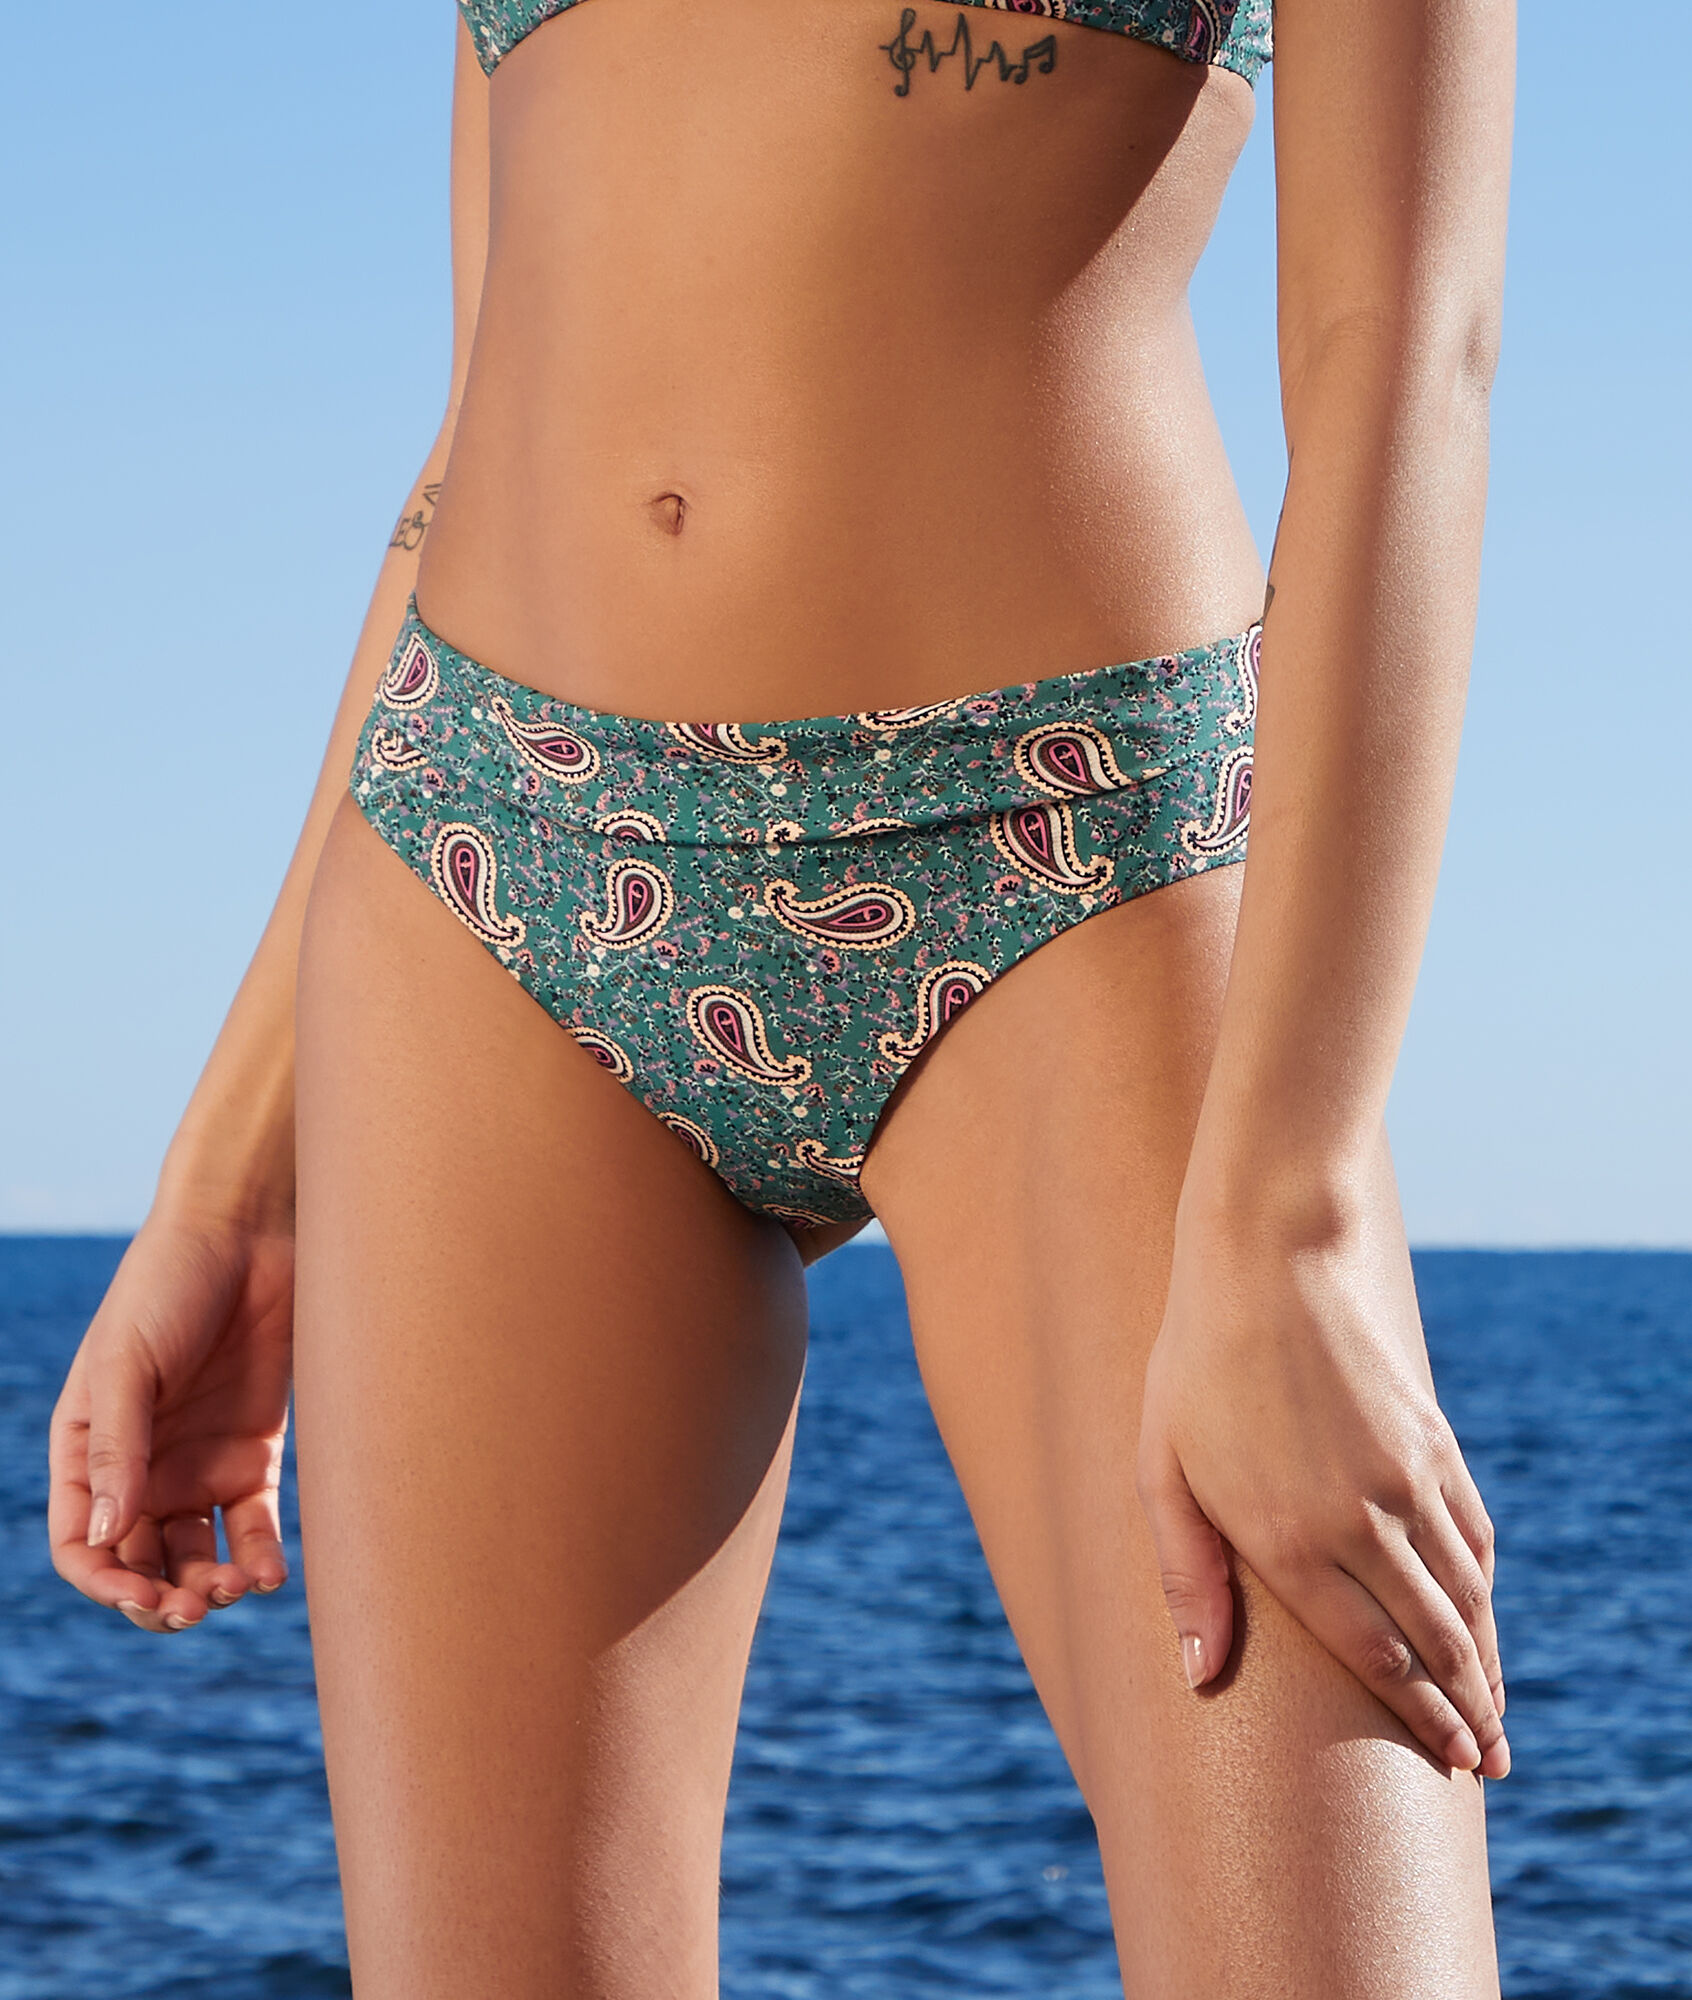 ETAM Sunset Beach Maillots de bain bikini shorty culotte bas uniquement Beach Mix /& Match